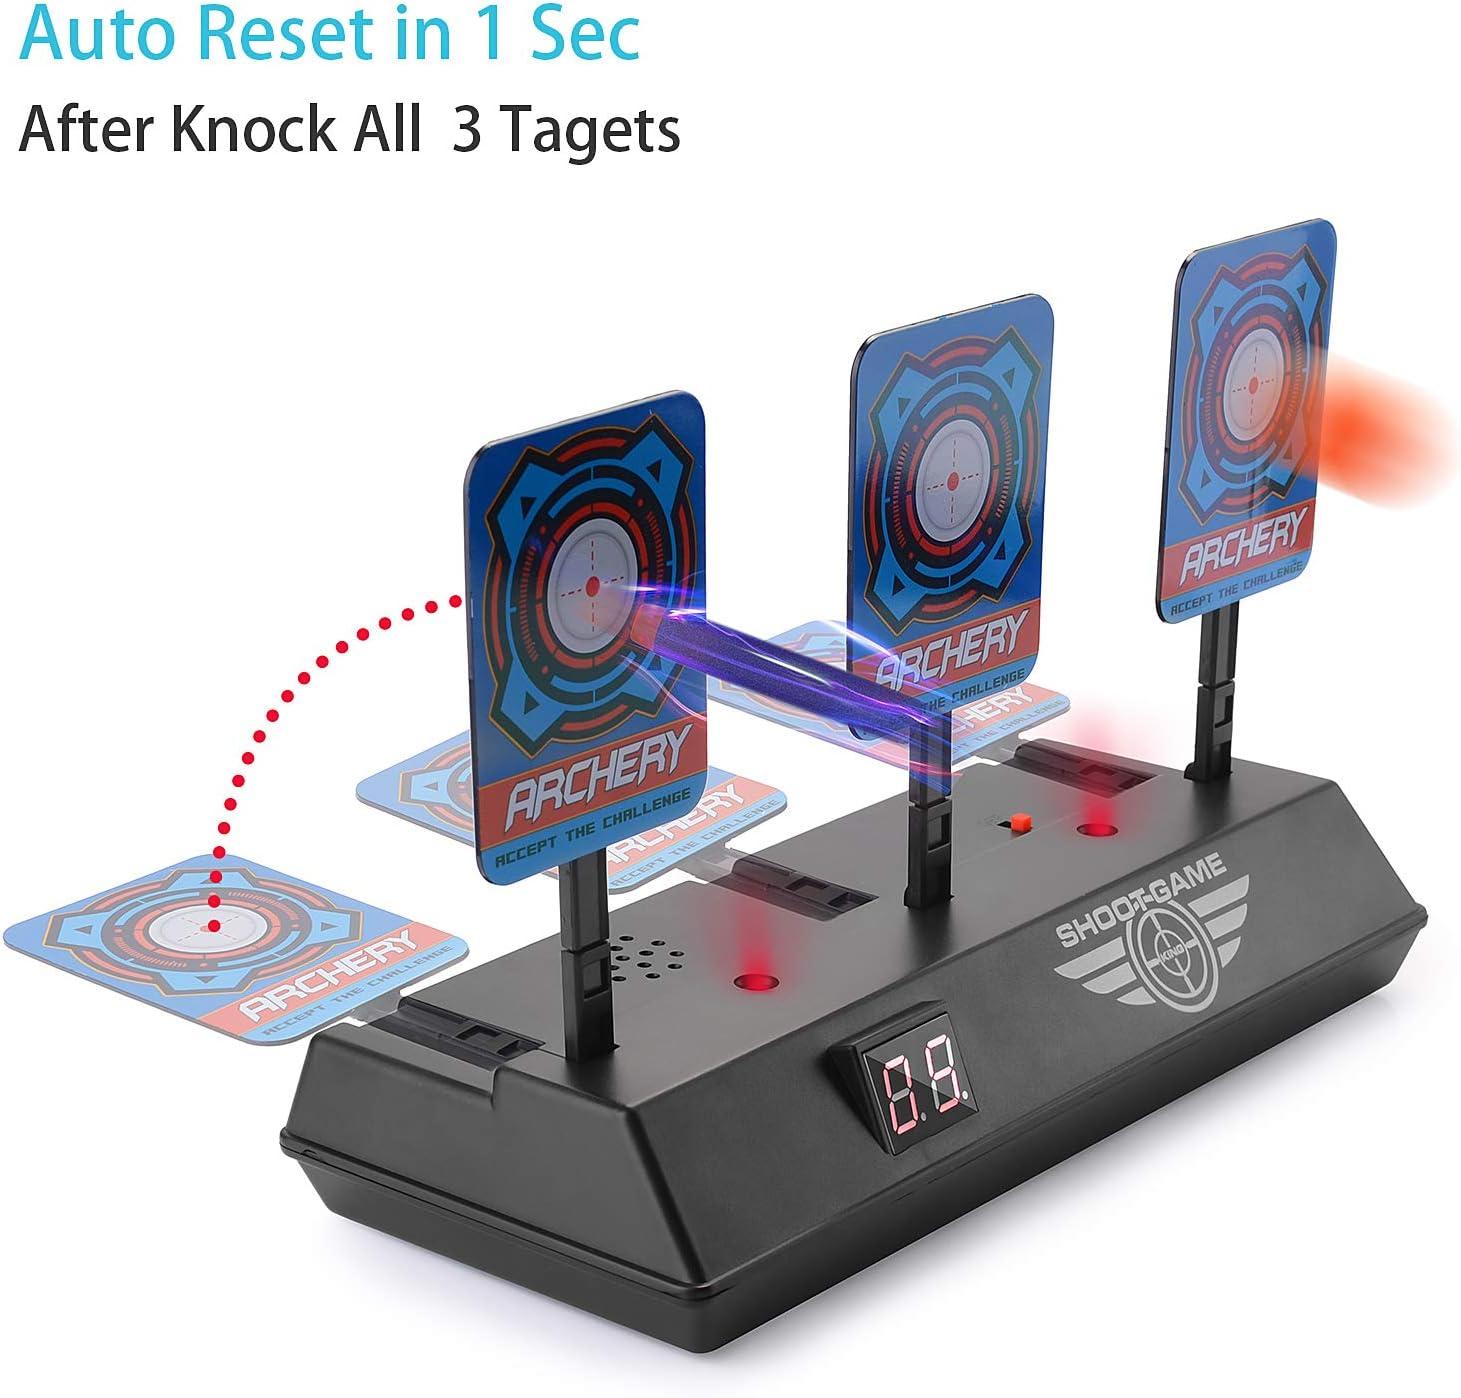 EKKONG Pistola de Juguete Objetivos,Auto Reset Shooting Target ,Objetivos Auto-Reset con Efecto de Sonido Electric Target